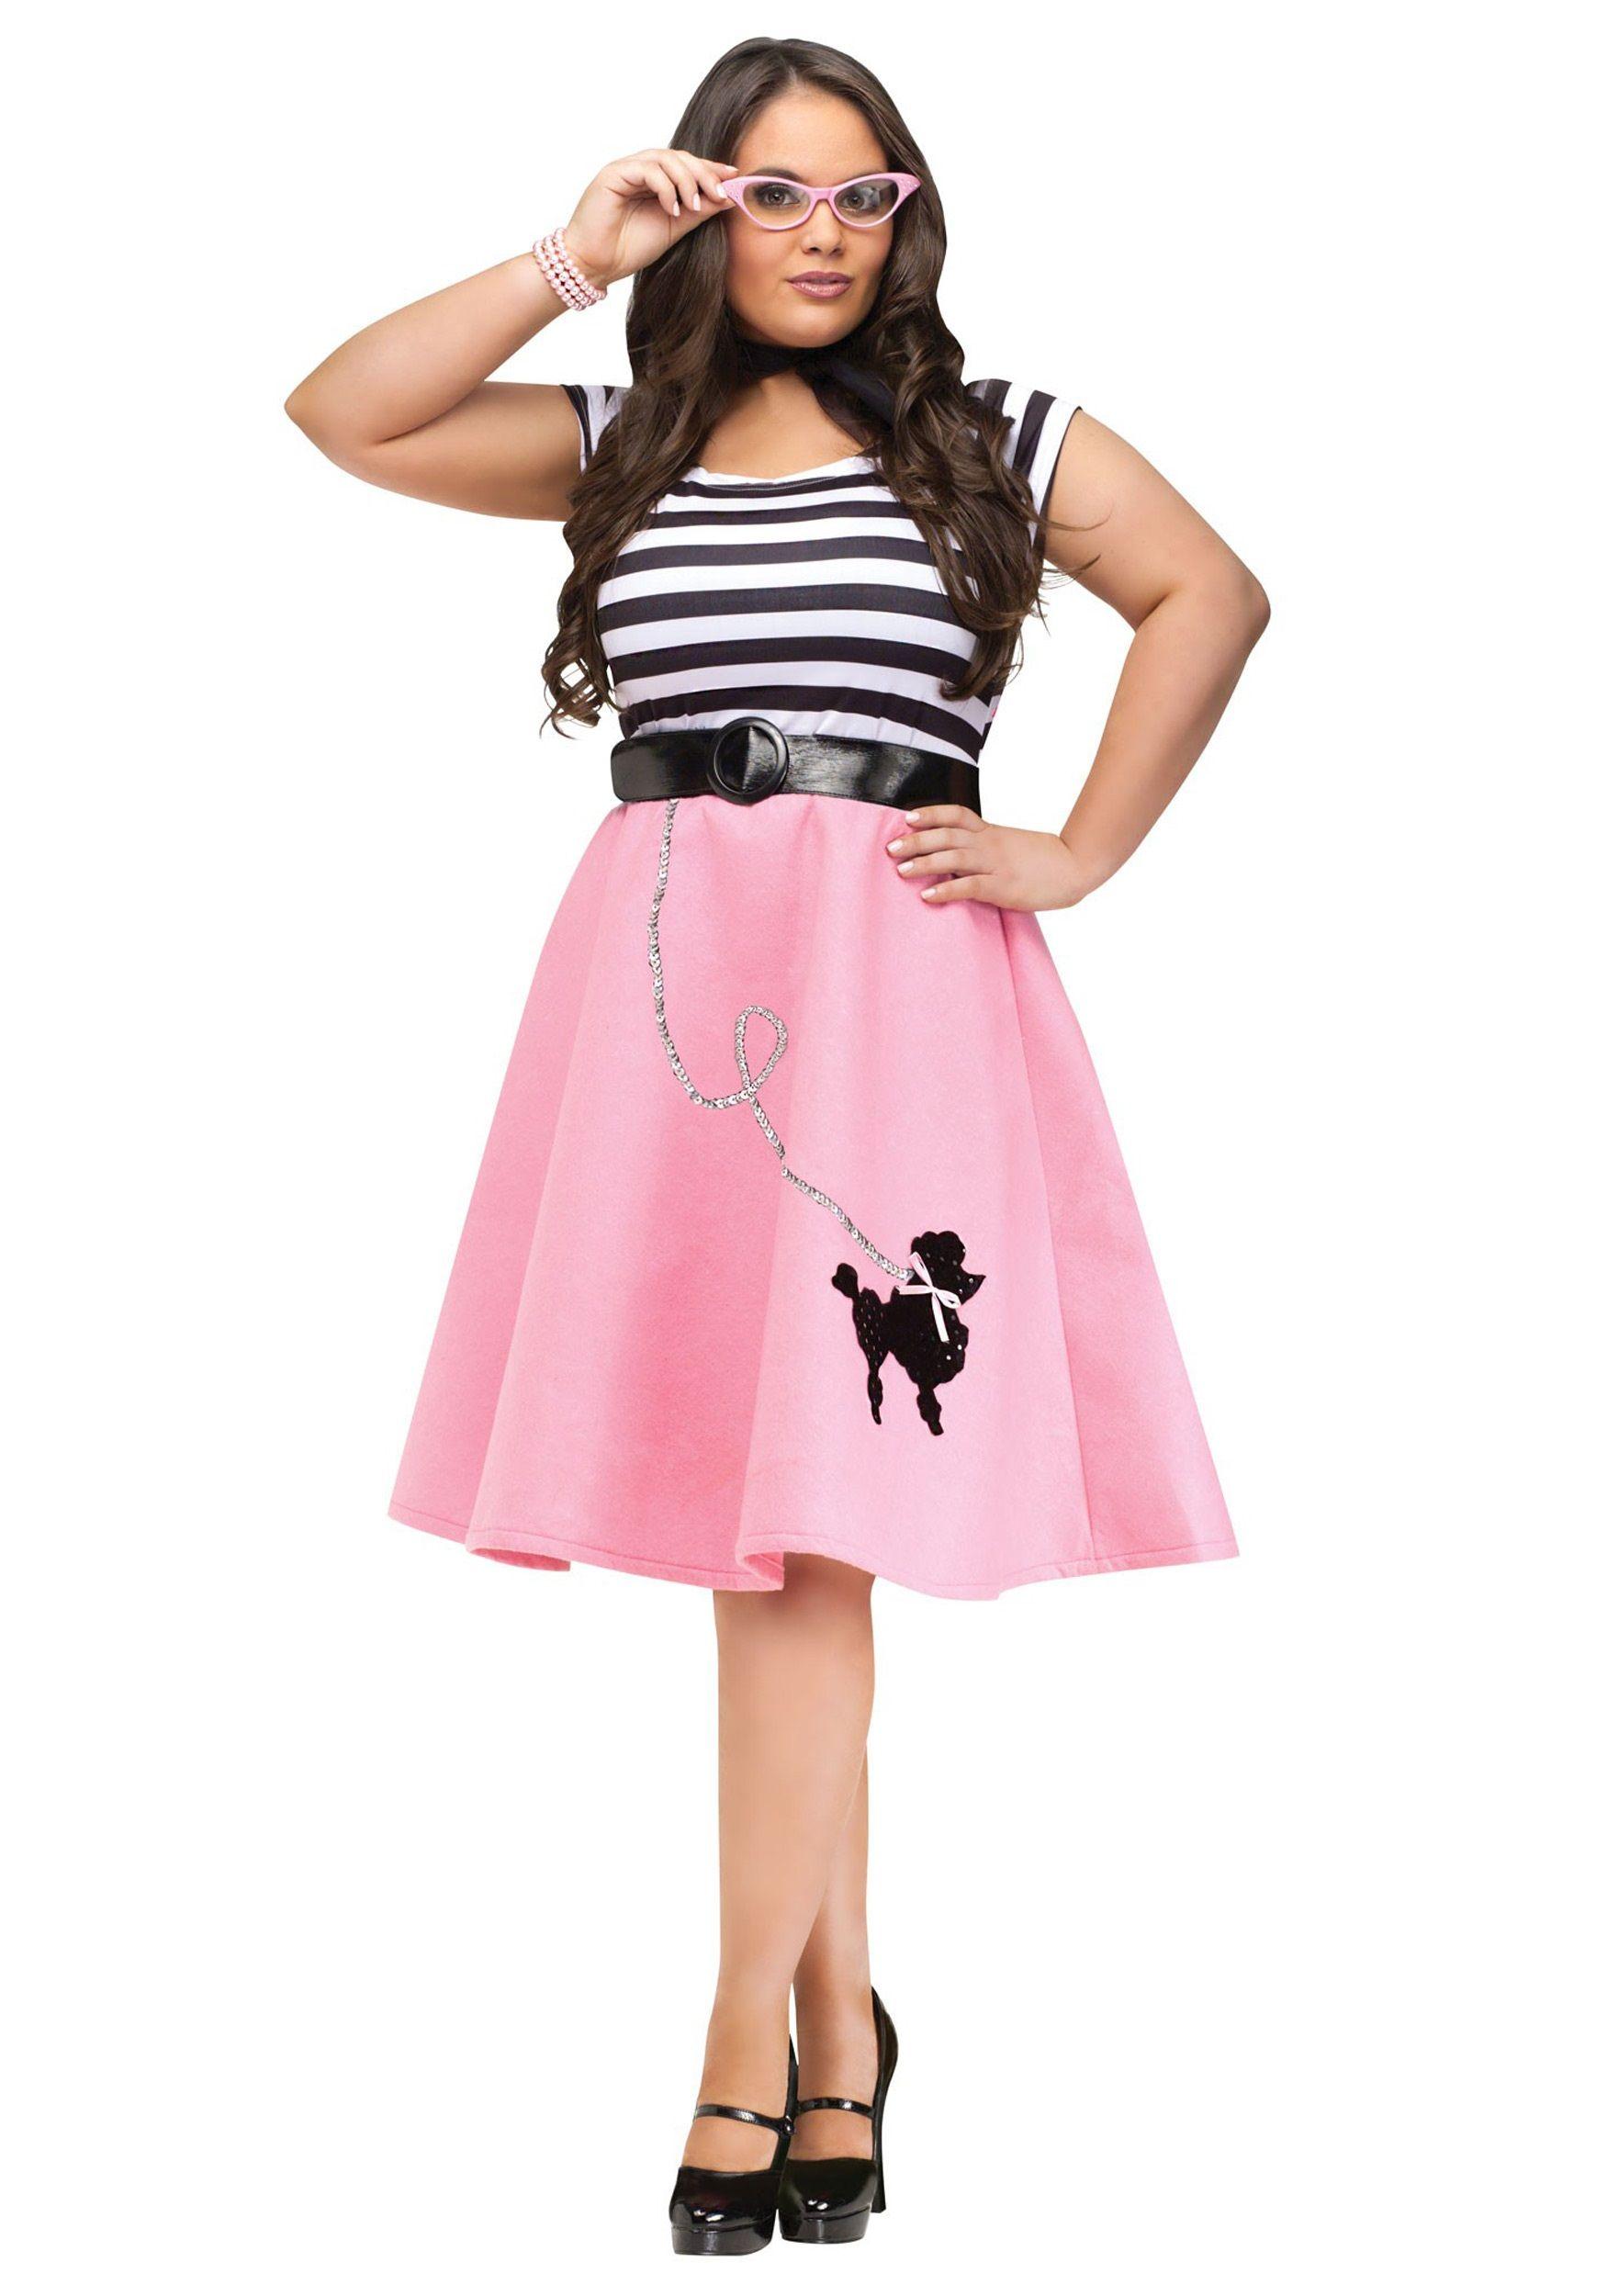 Plus Size Poodle Skirt Dress | Halloween | Pinterest